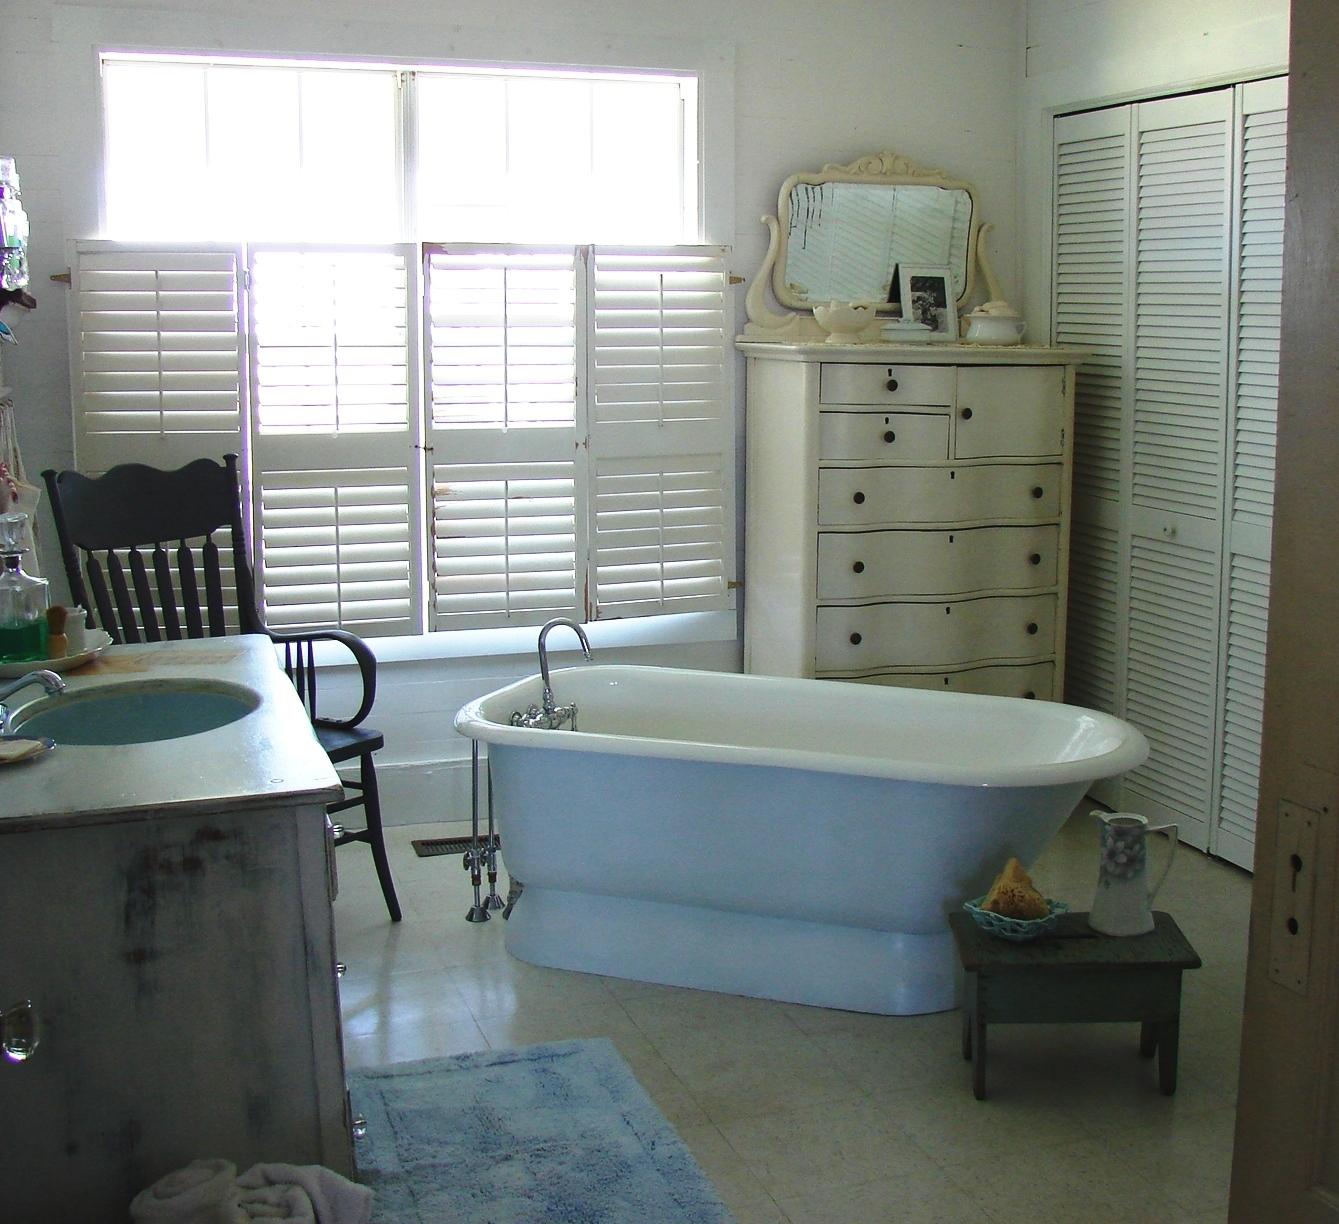 1930s Bathroom Design The Country Farm Home The 1930s Country Bath